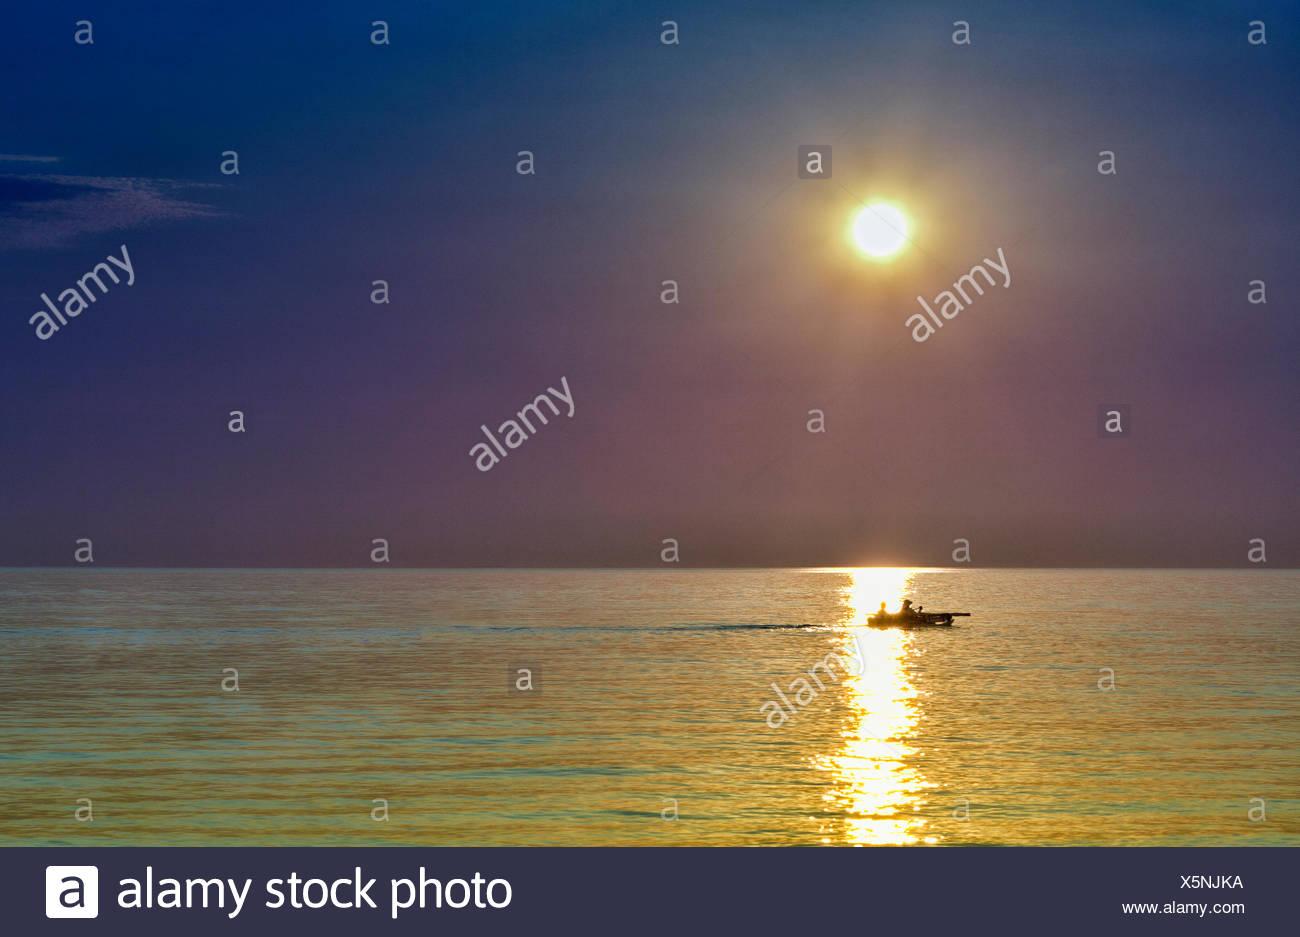 USA, Indiana, Indiana Dunes State Park, Calumet Trail, Furnessville, Sailing boat at sunset at Lake Michigan - Stock Image